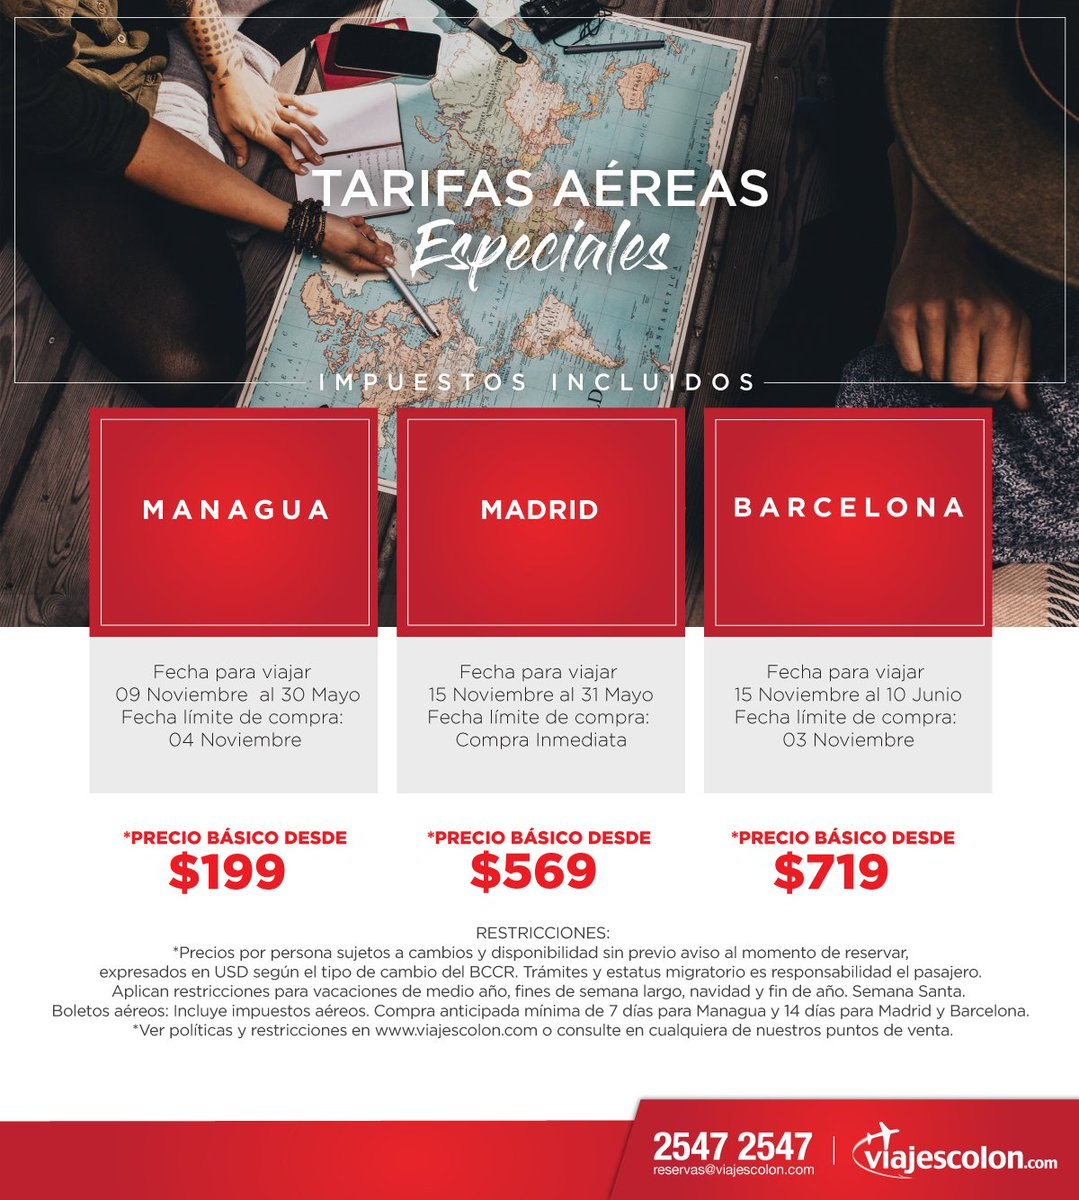 ¡Viva la historia de #Managua con un click! *Precio básico desde $199.   https://t.co/oOCsf2m8RM reservas@viajescolon.com #Madrid #Barcelona https://t.co/amBHUv7wjs